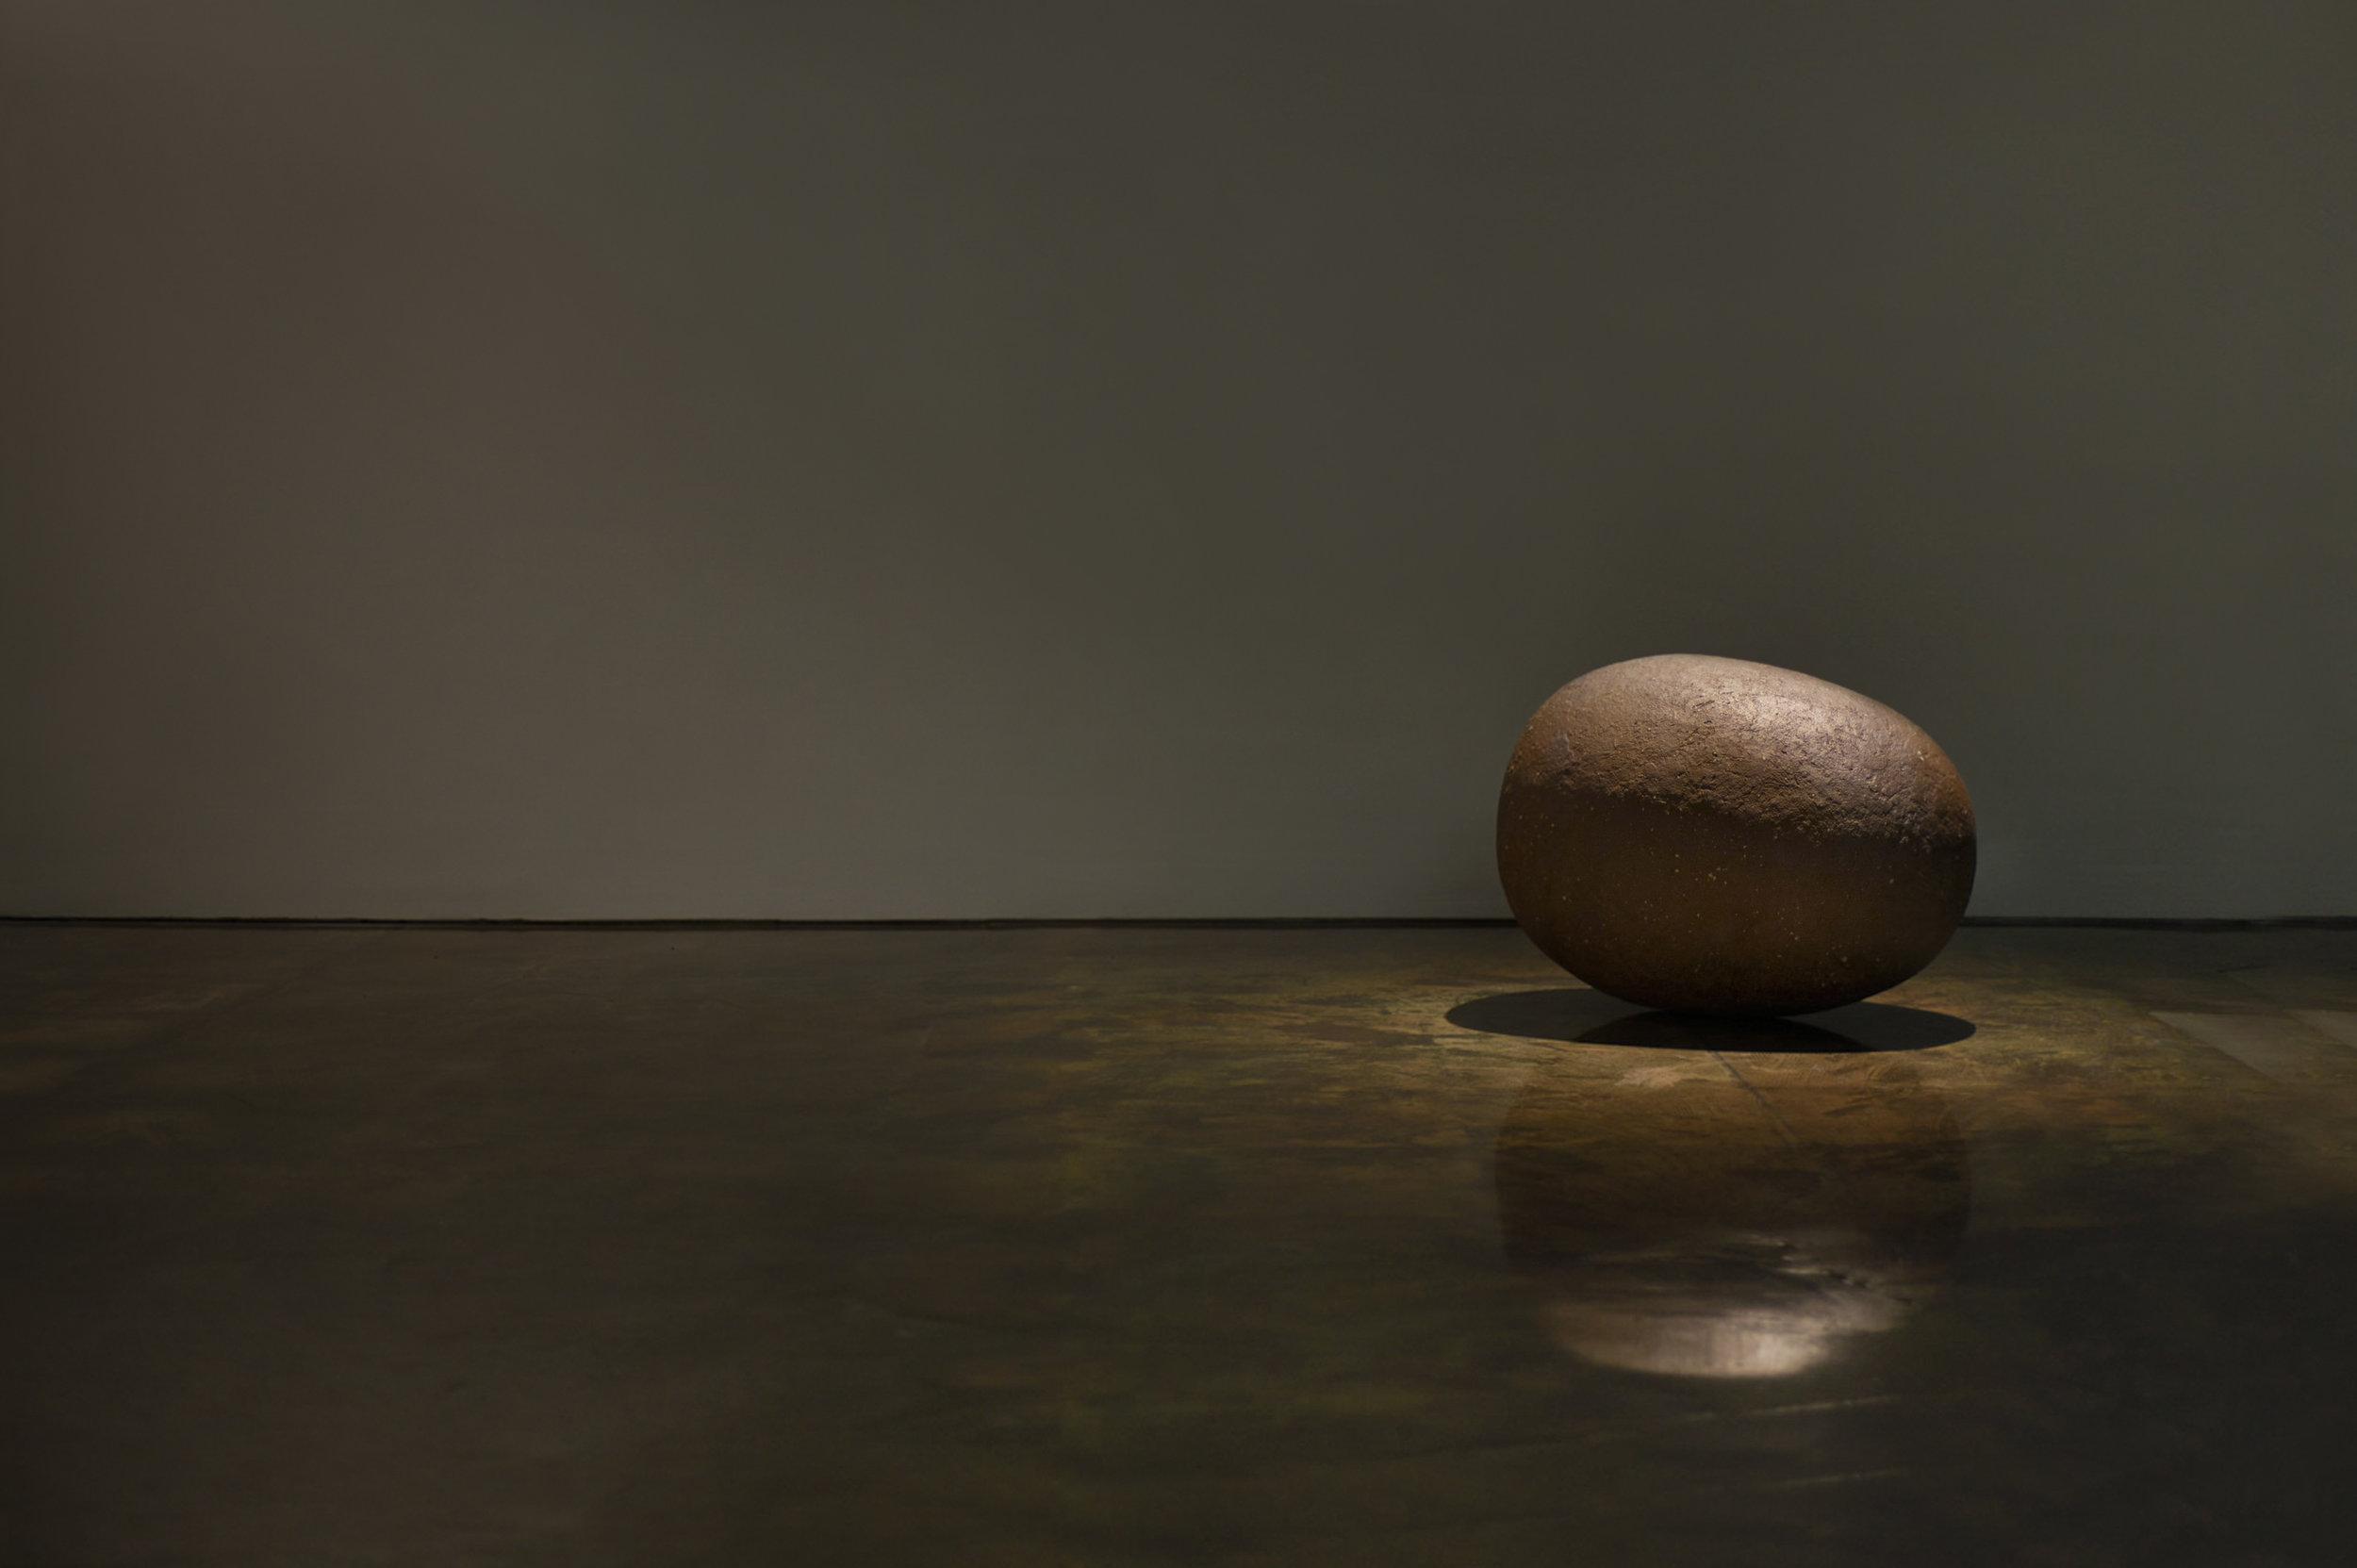 Soil , 2008 44.5 x 58 x 45 cm Photograph by Ayaka Horiuchi